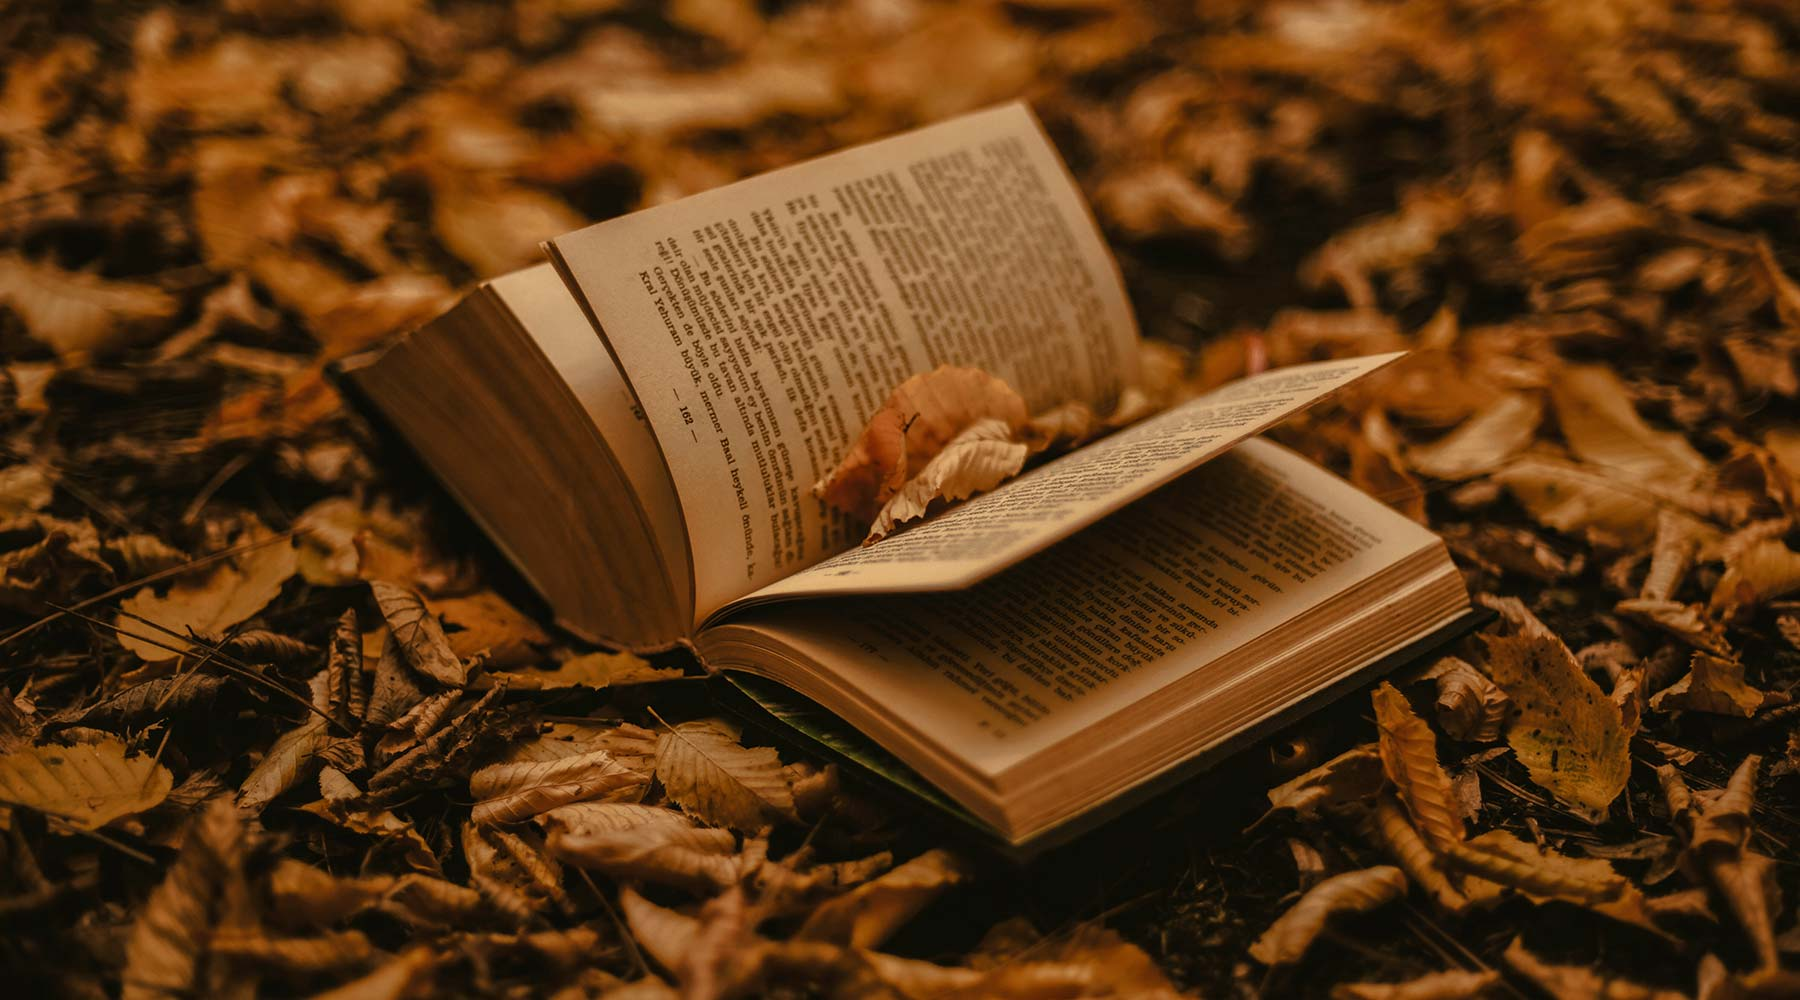 Book on leaves